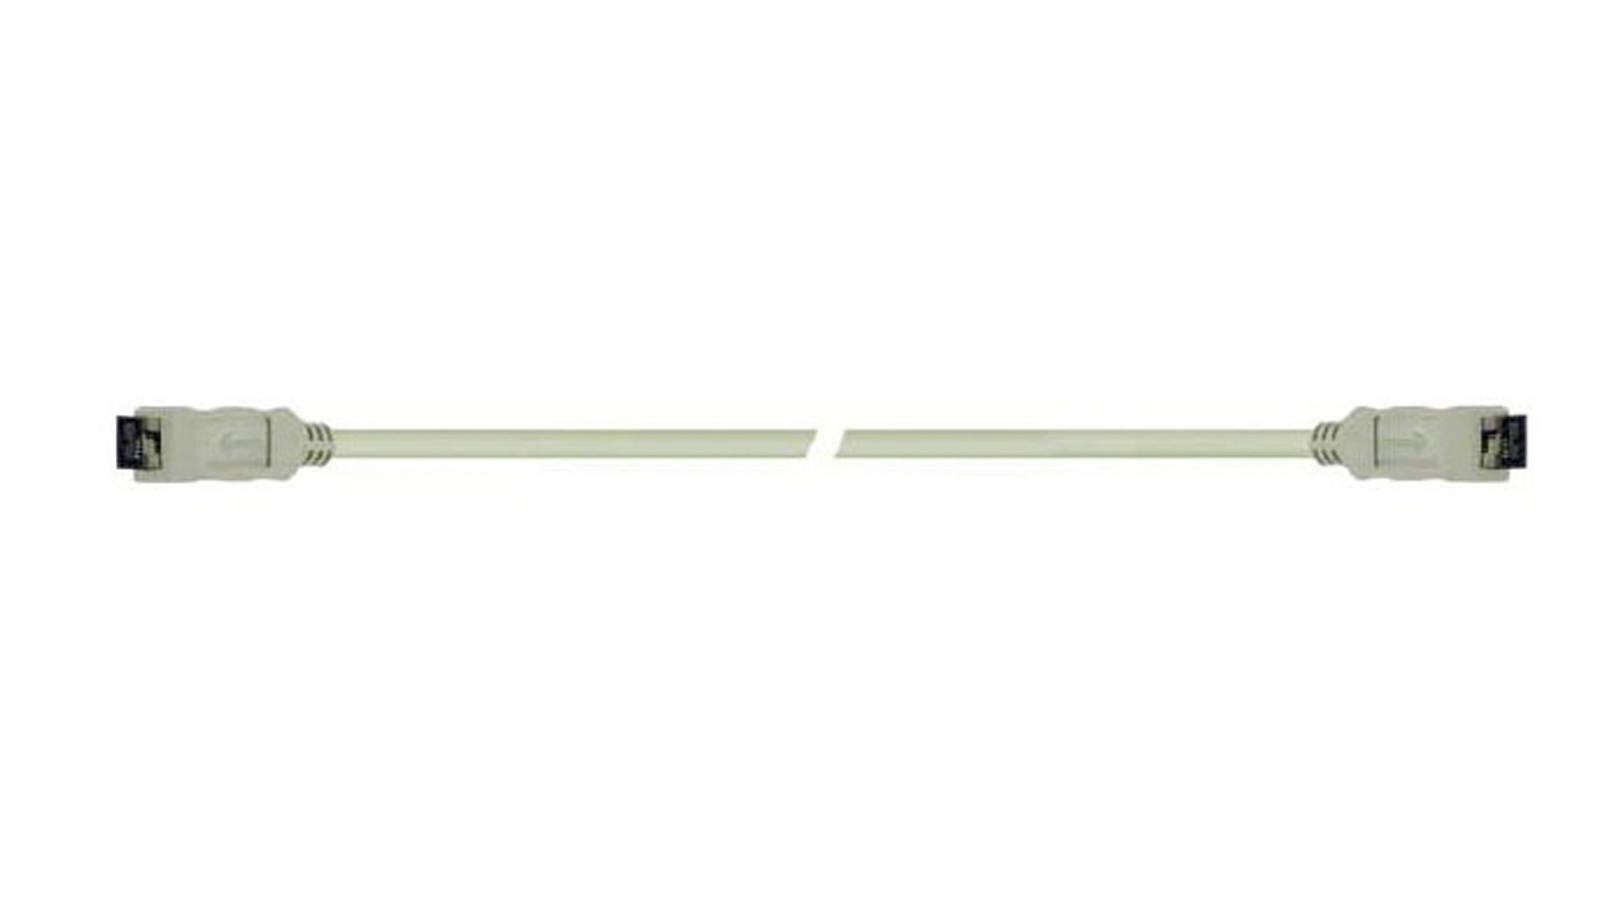 DREITEC Firewire Kabel 800Mbs 5m